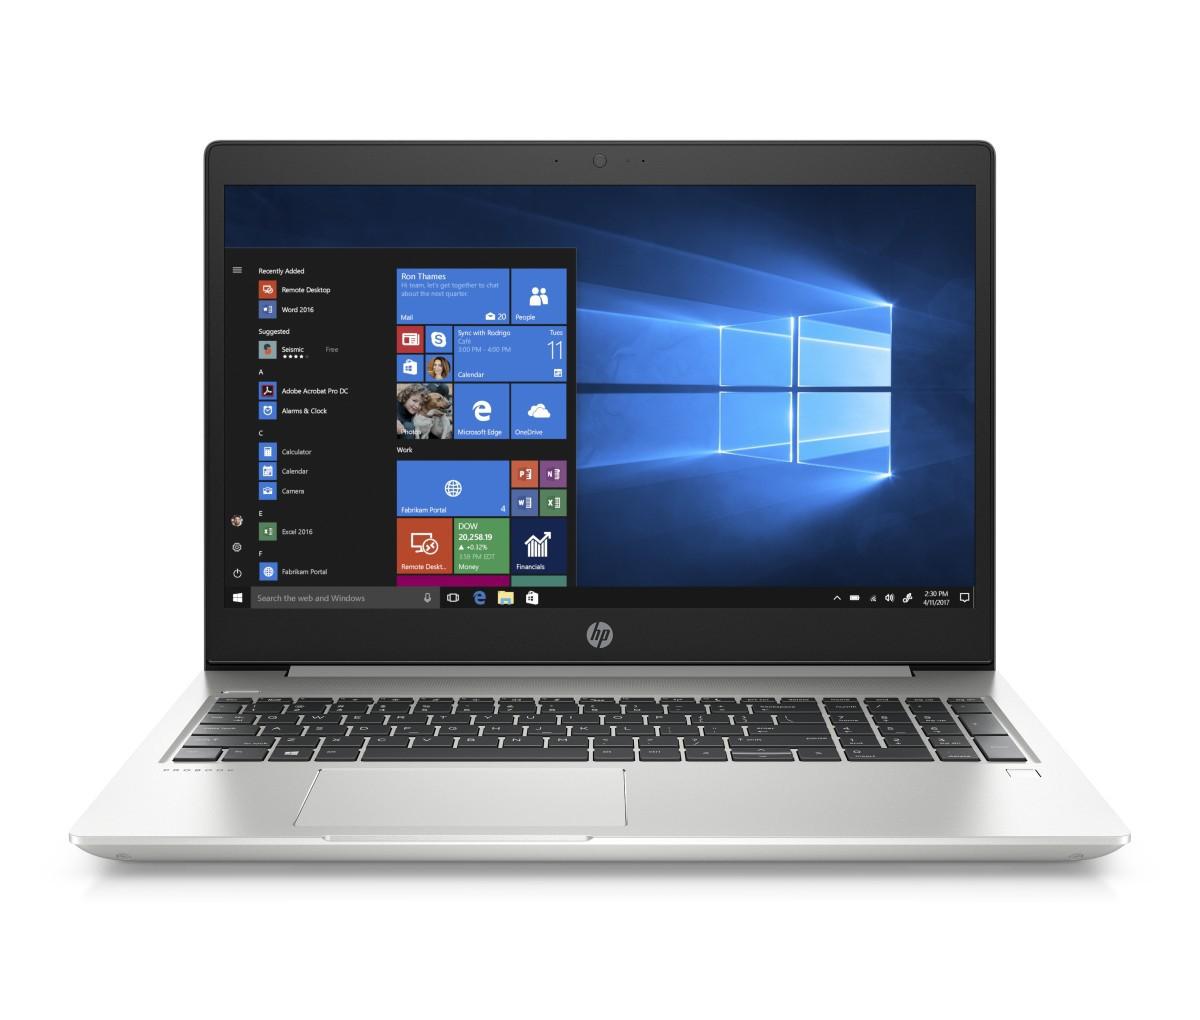 Notebook HP ProBook 455 G6 (6MR46ES)